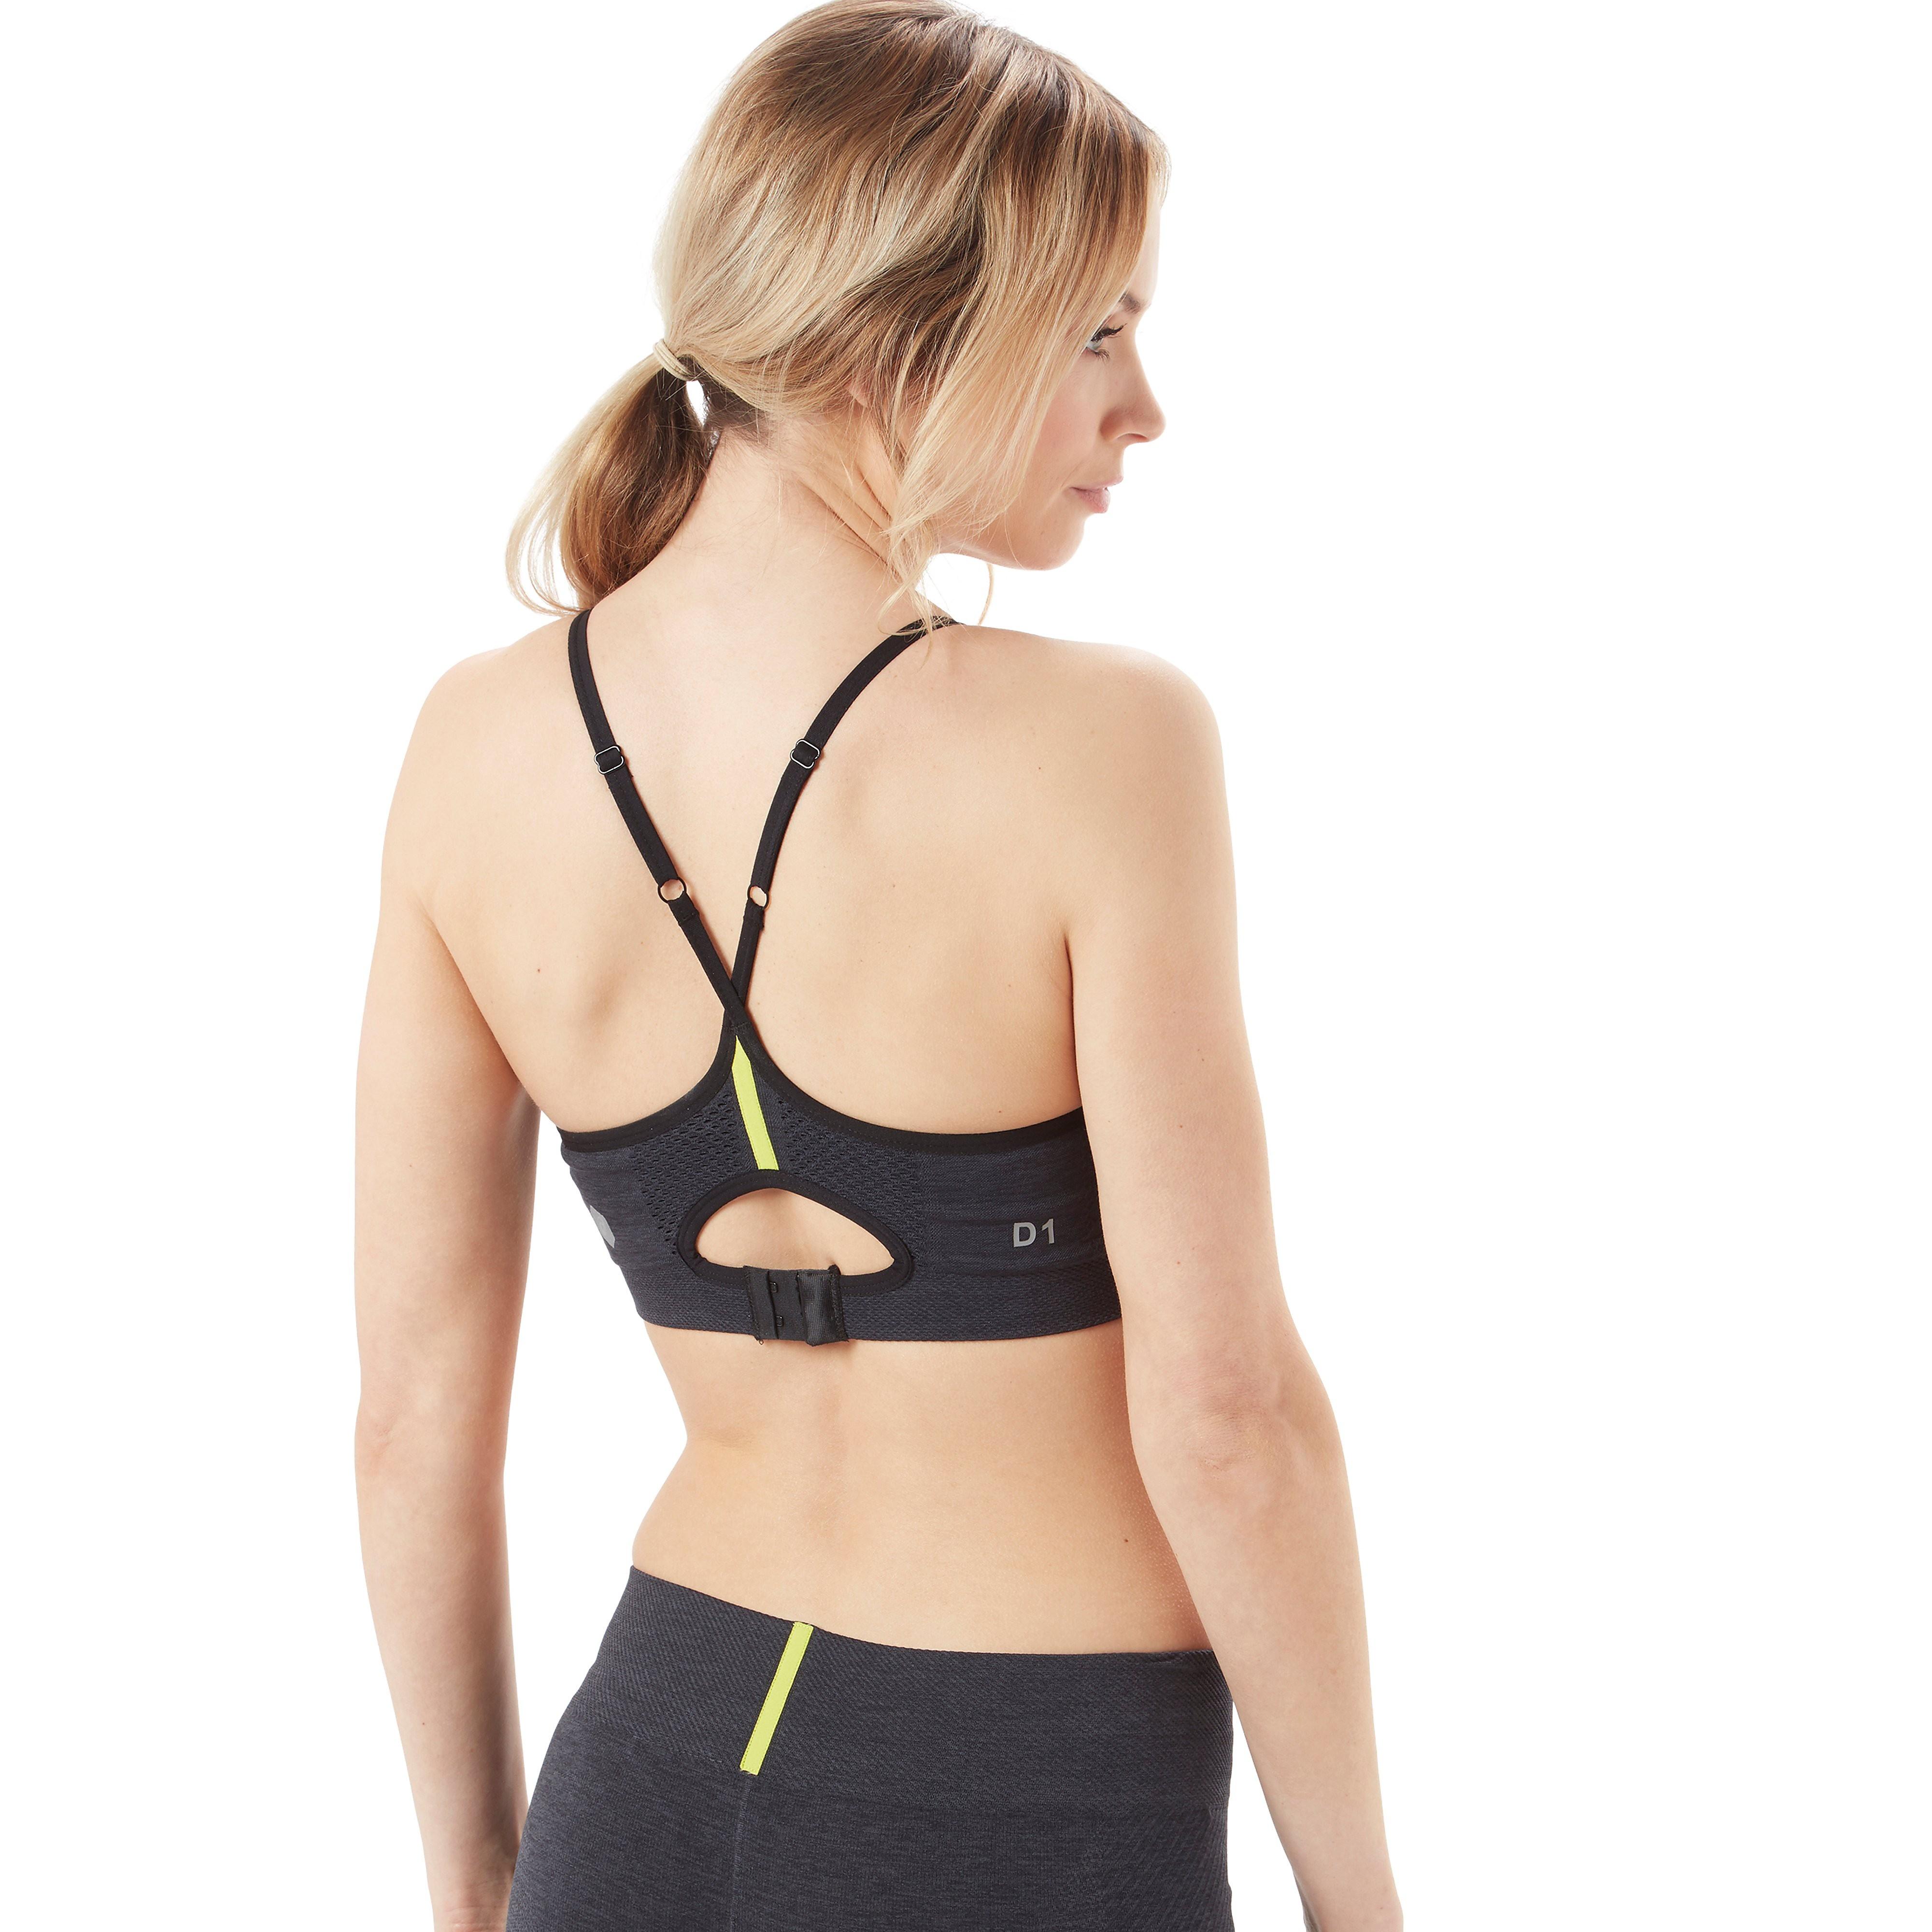 ASICS Seamless Adjustable Women's Training Bra